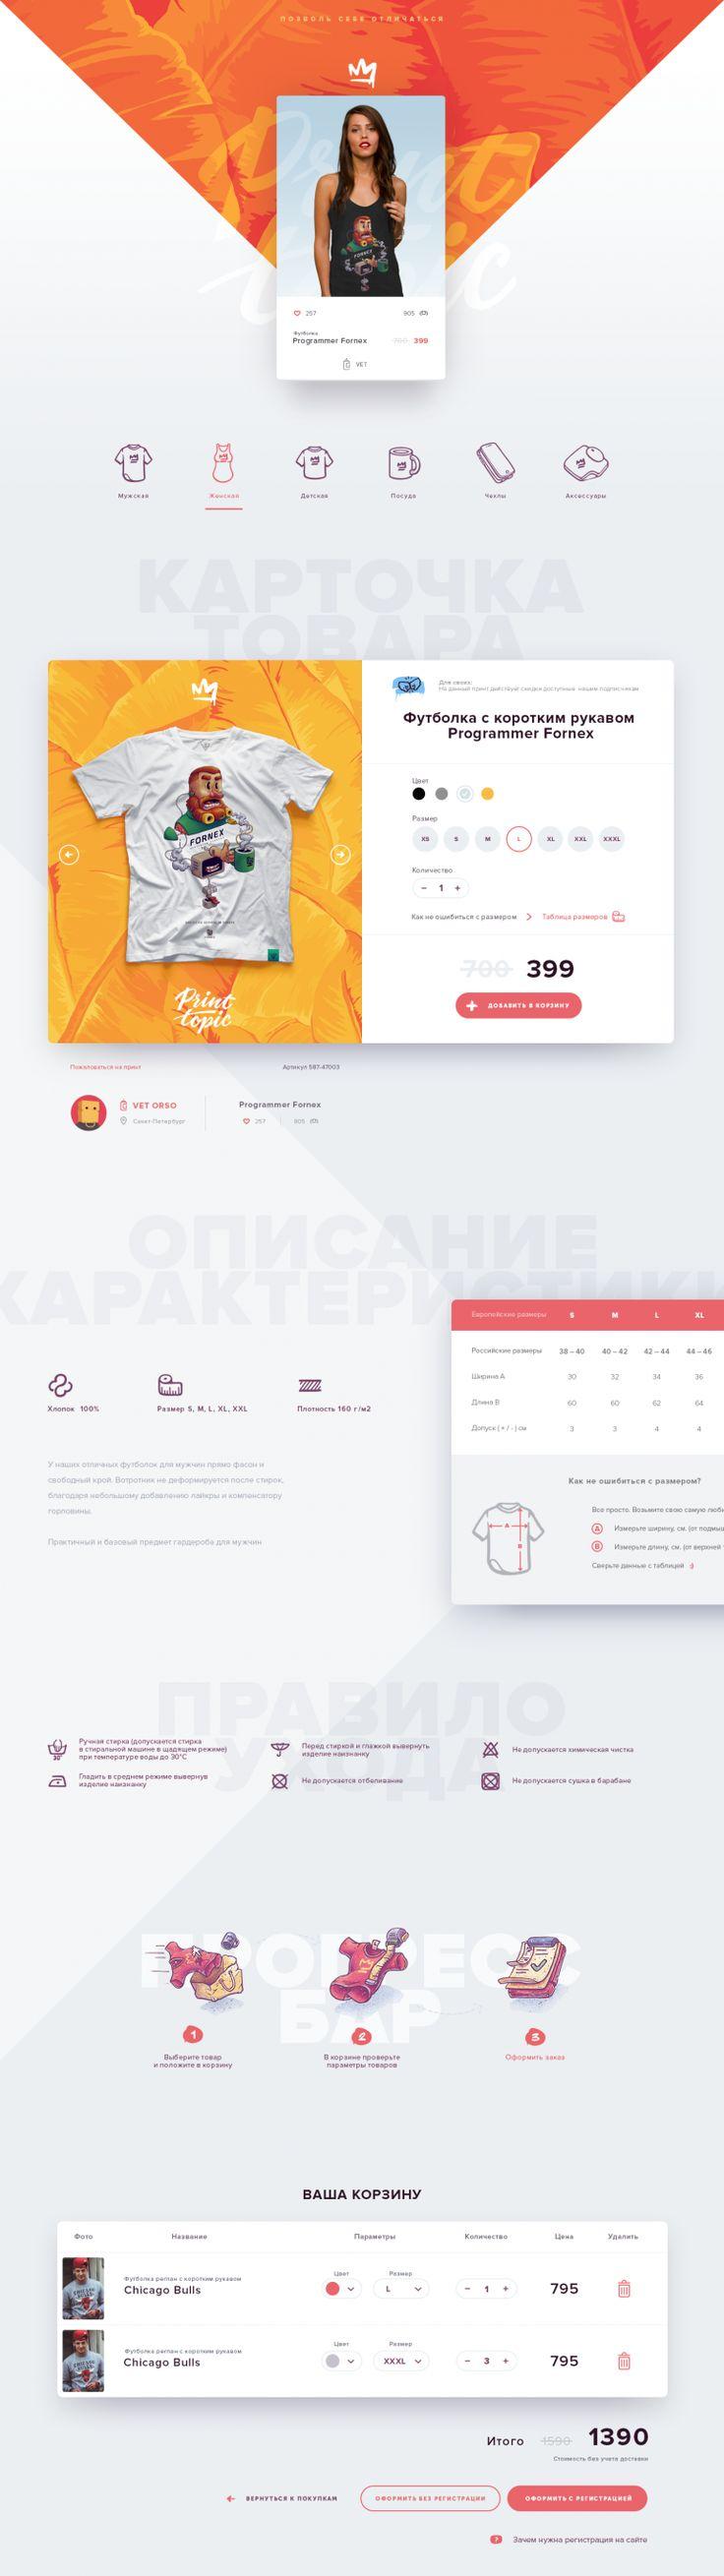 Print Topic Shop   Web design   Ui   illustration